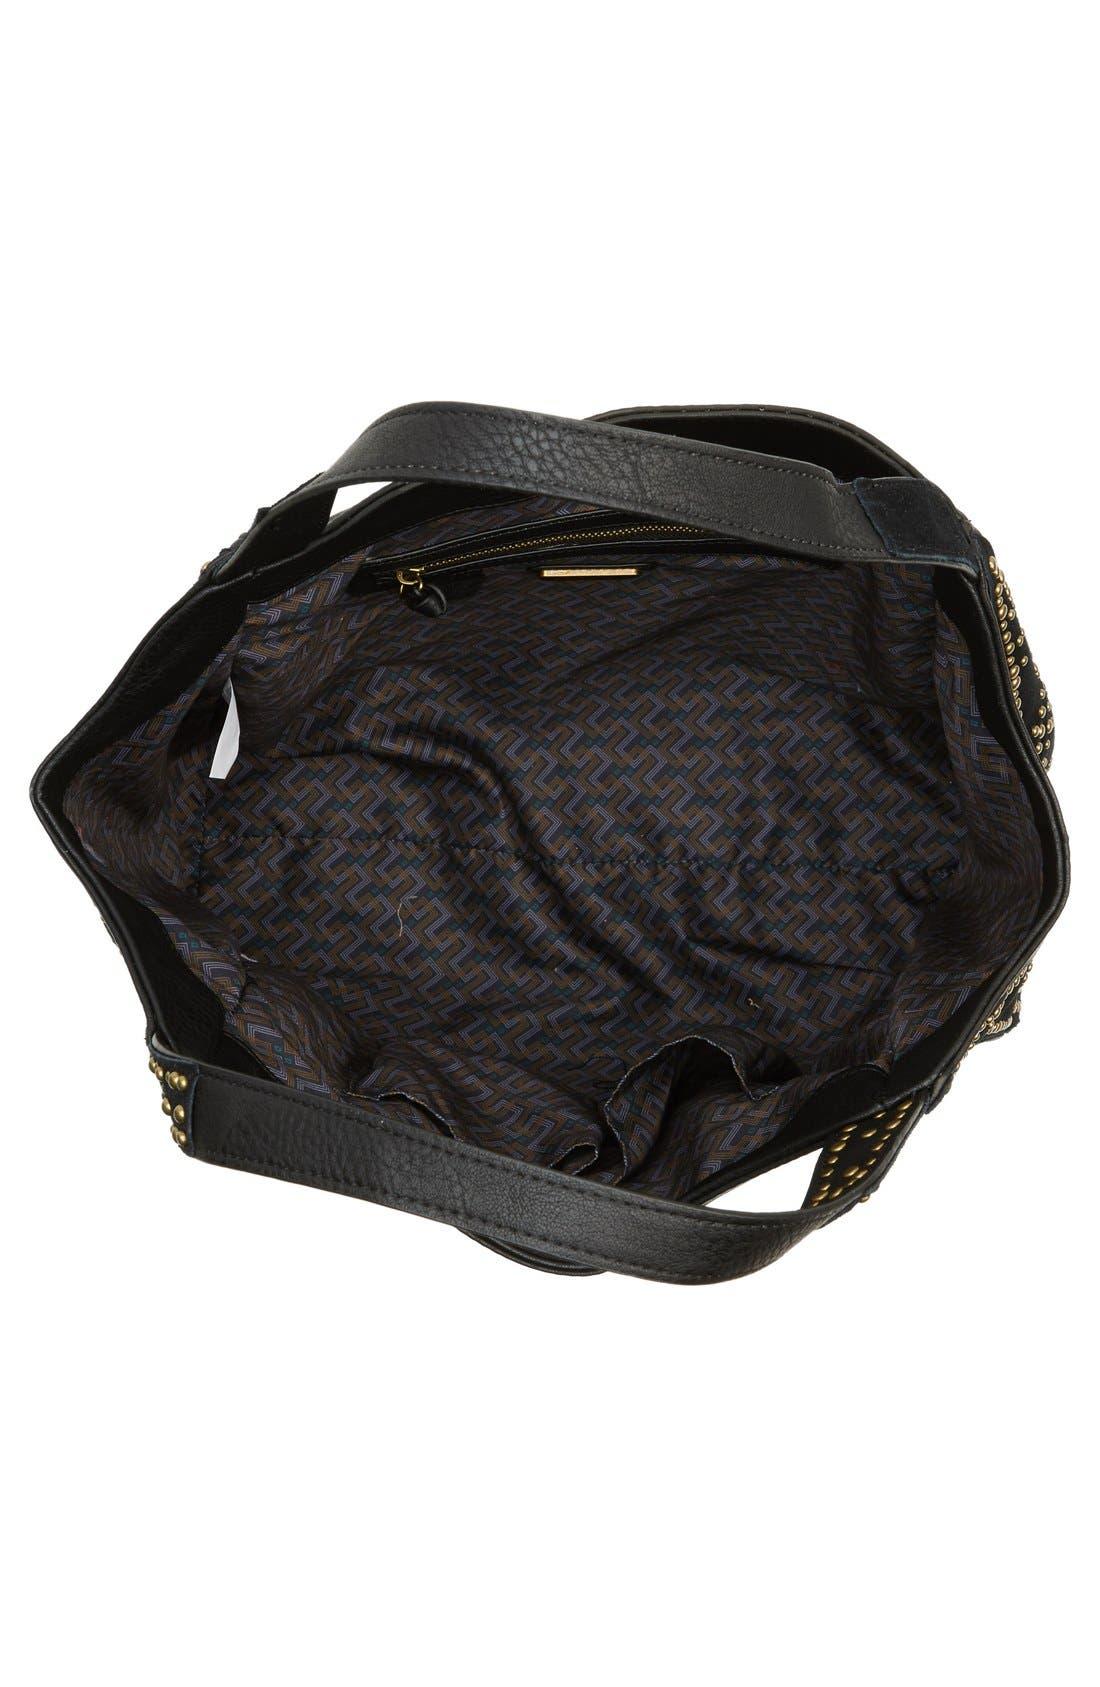 'Jlora' Studded Hobo Bag,                             Alternate thumbnail 3, color,                             Black